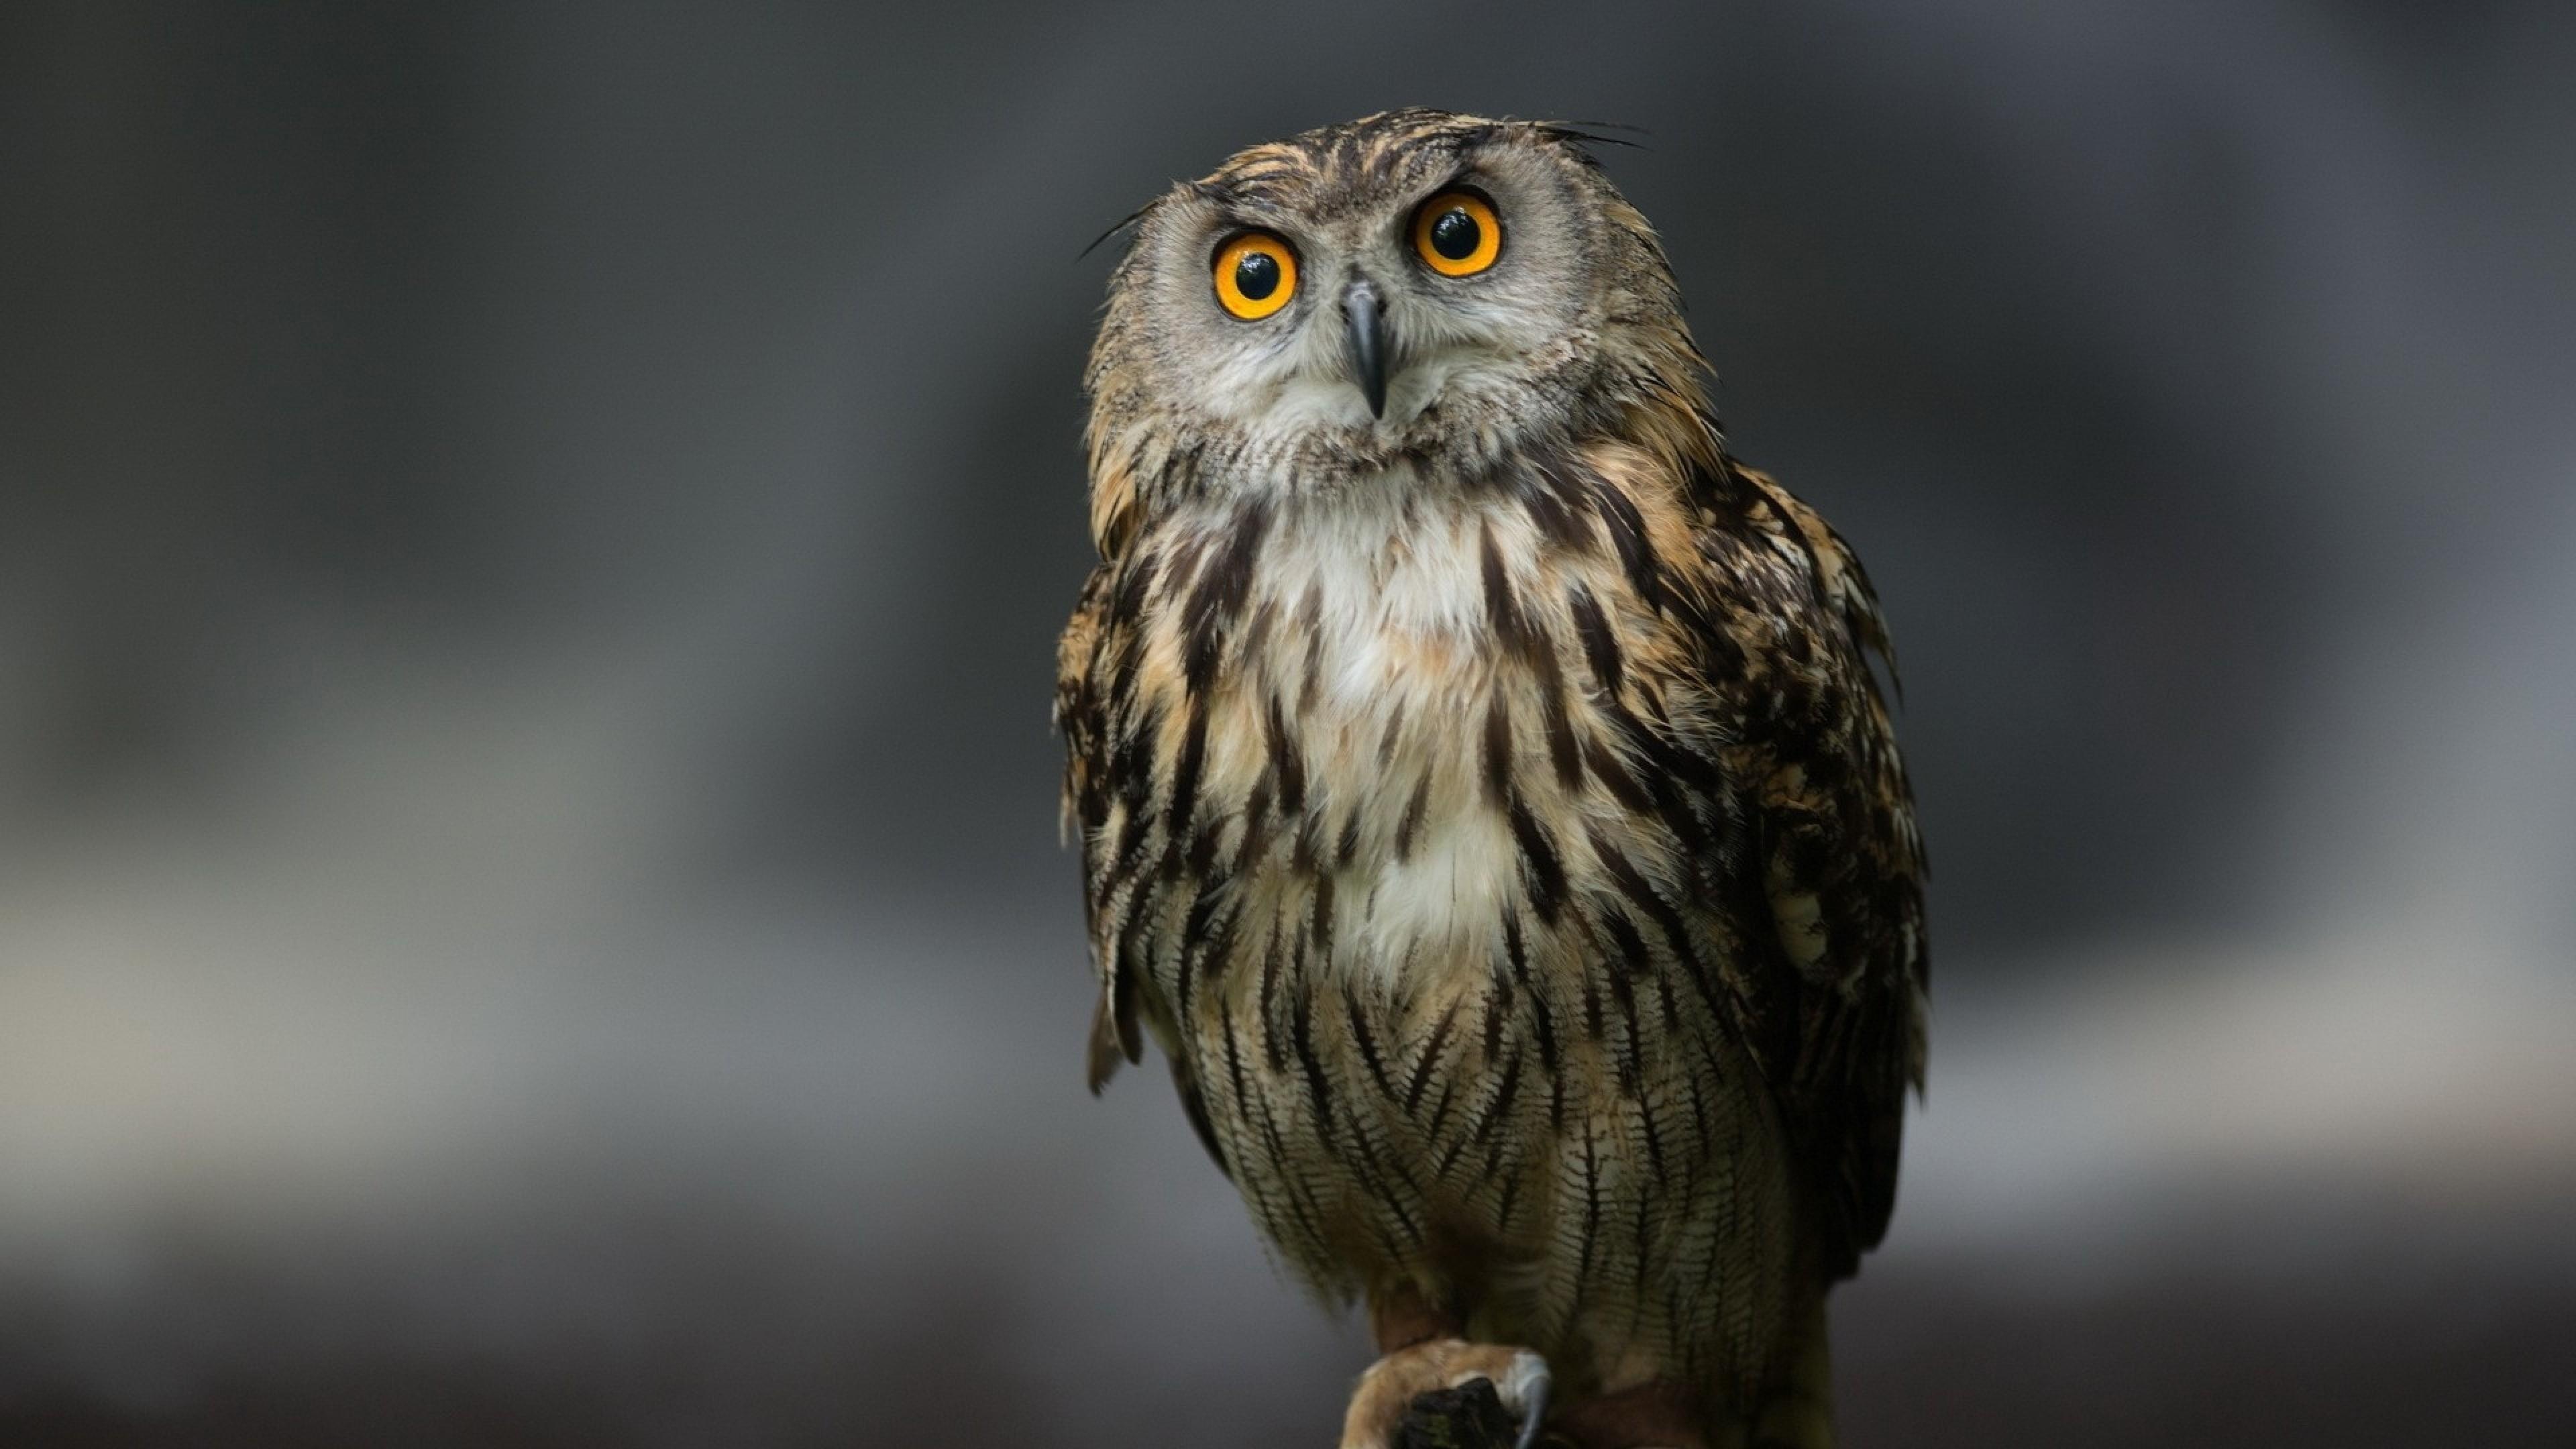 Wallpaper owl, bird, predator, sitting, feathers